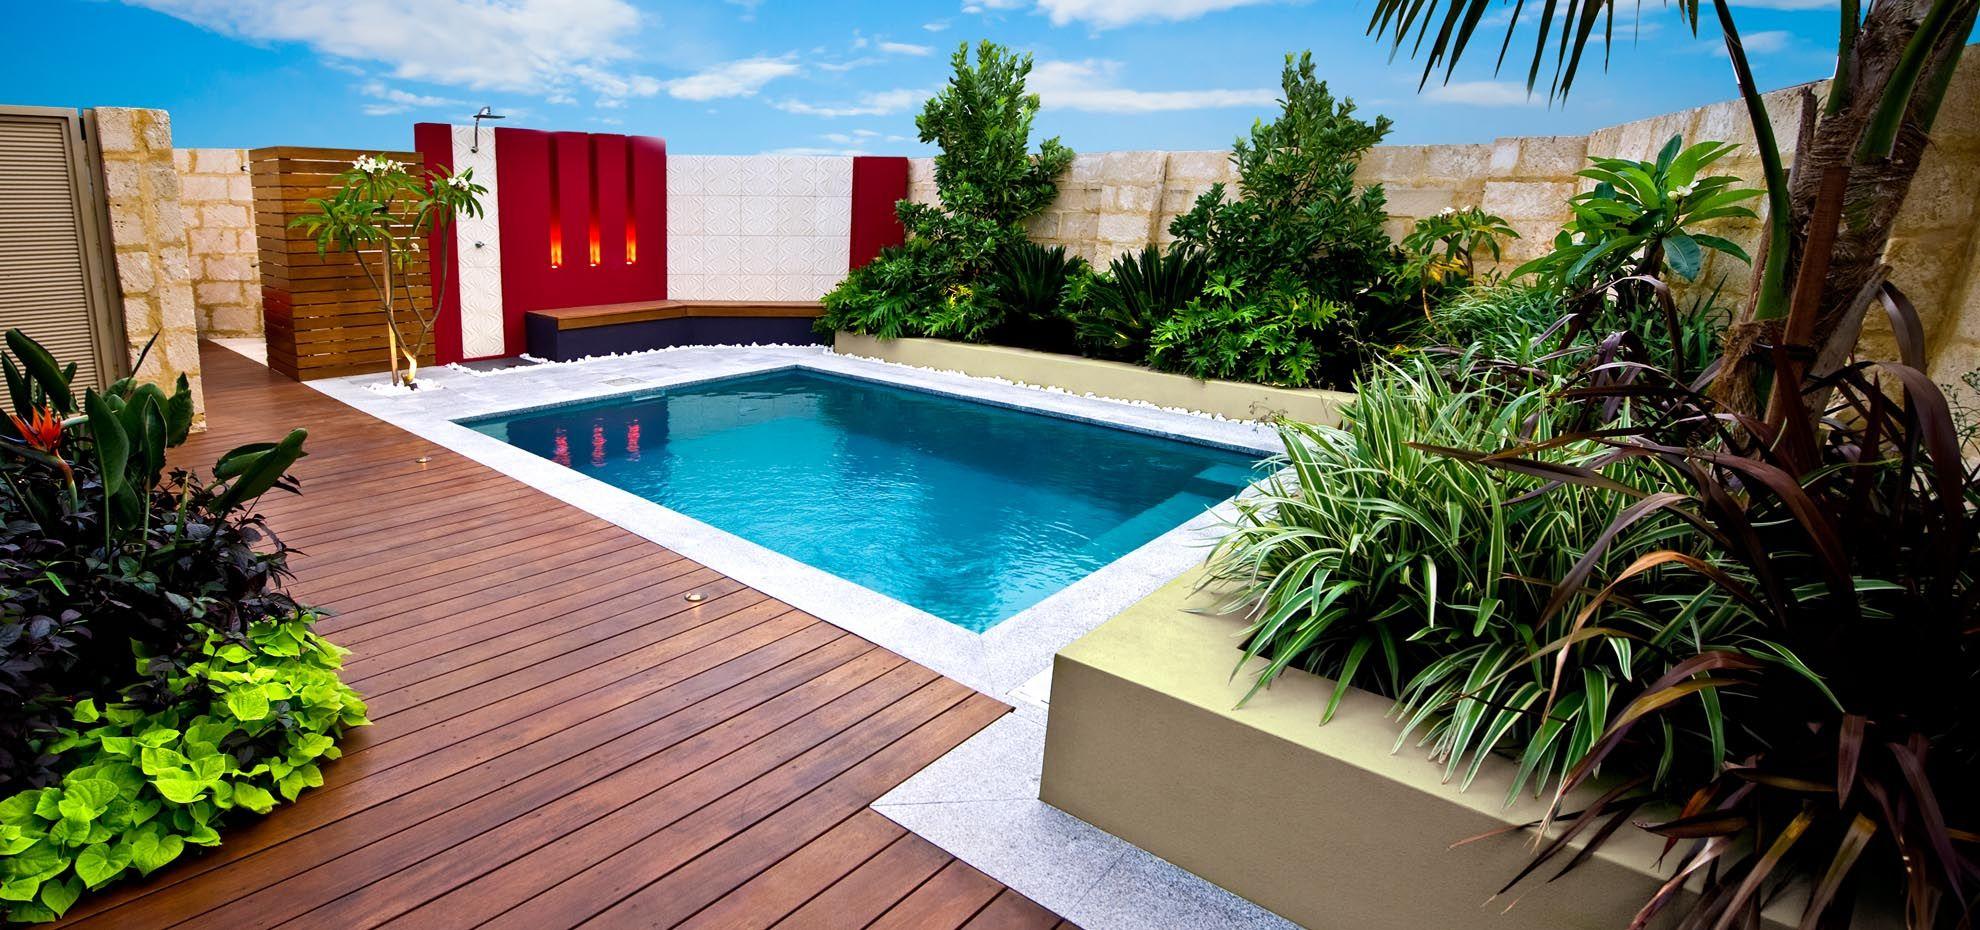 Plunge Pool Prices Small Fiberglass Pools Lap Pool Designs